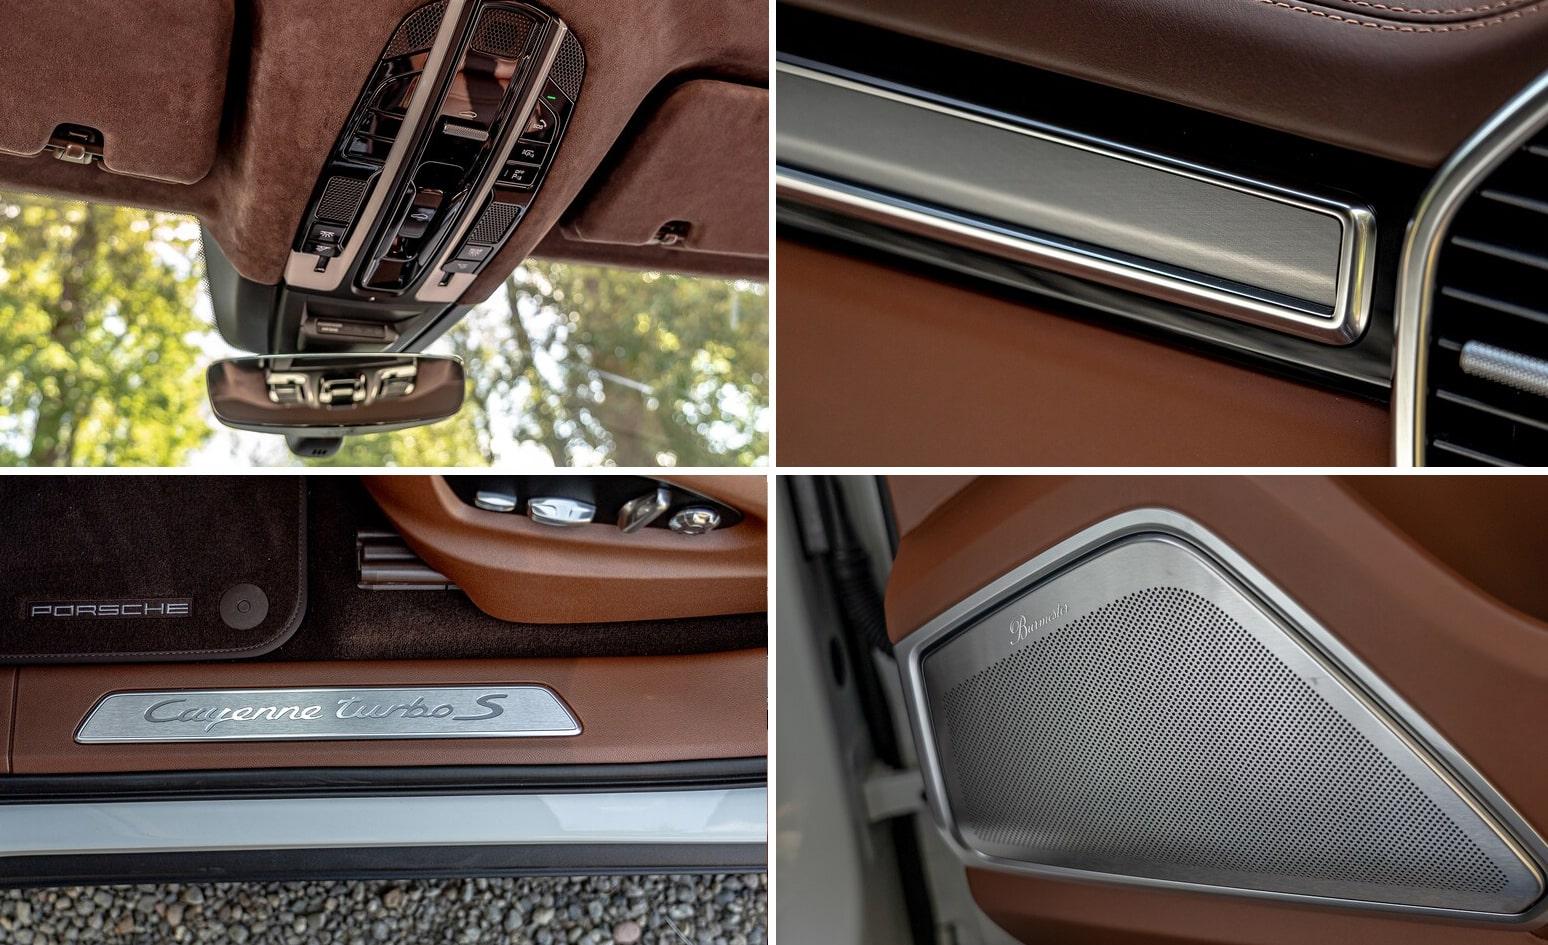 2019-porsche-cayenne-turbo-s-e-hybrid-drive-135--min